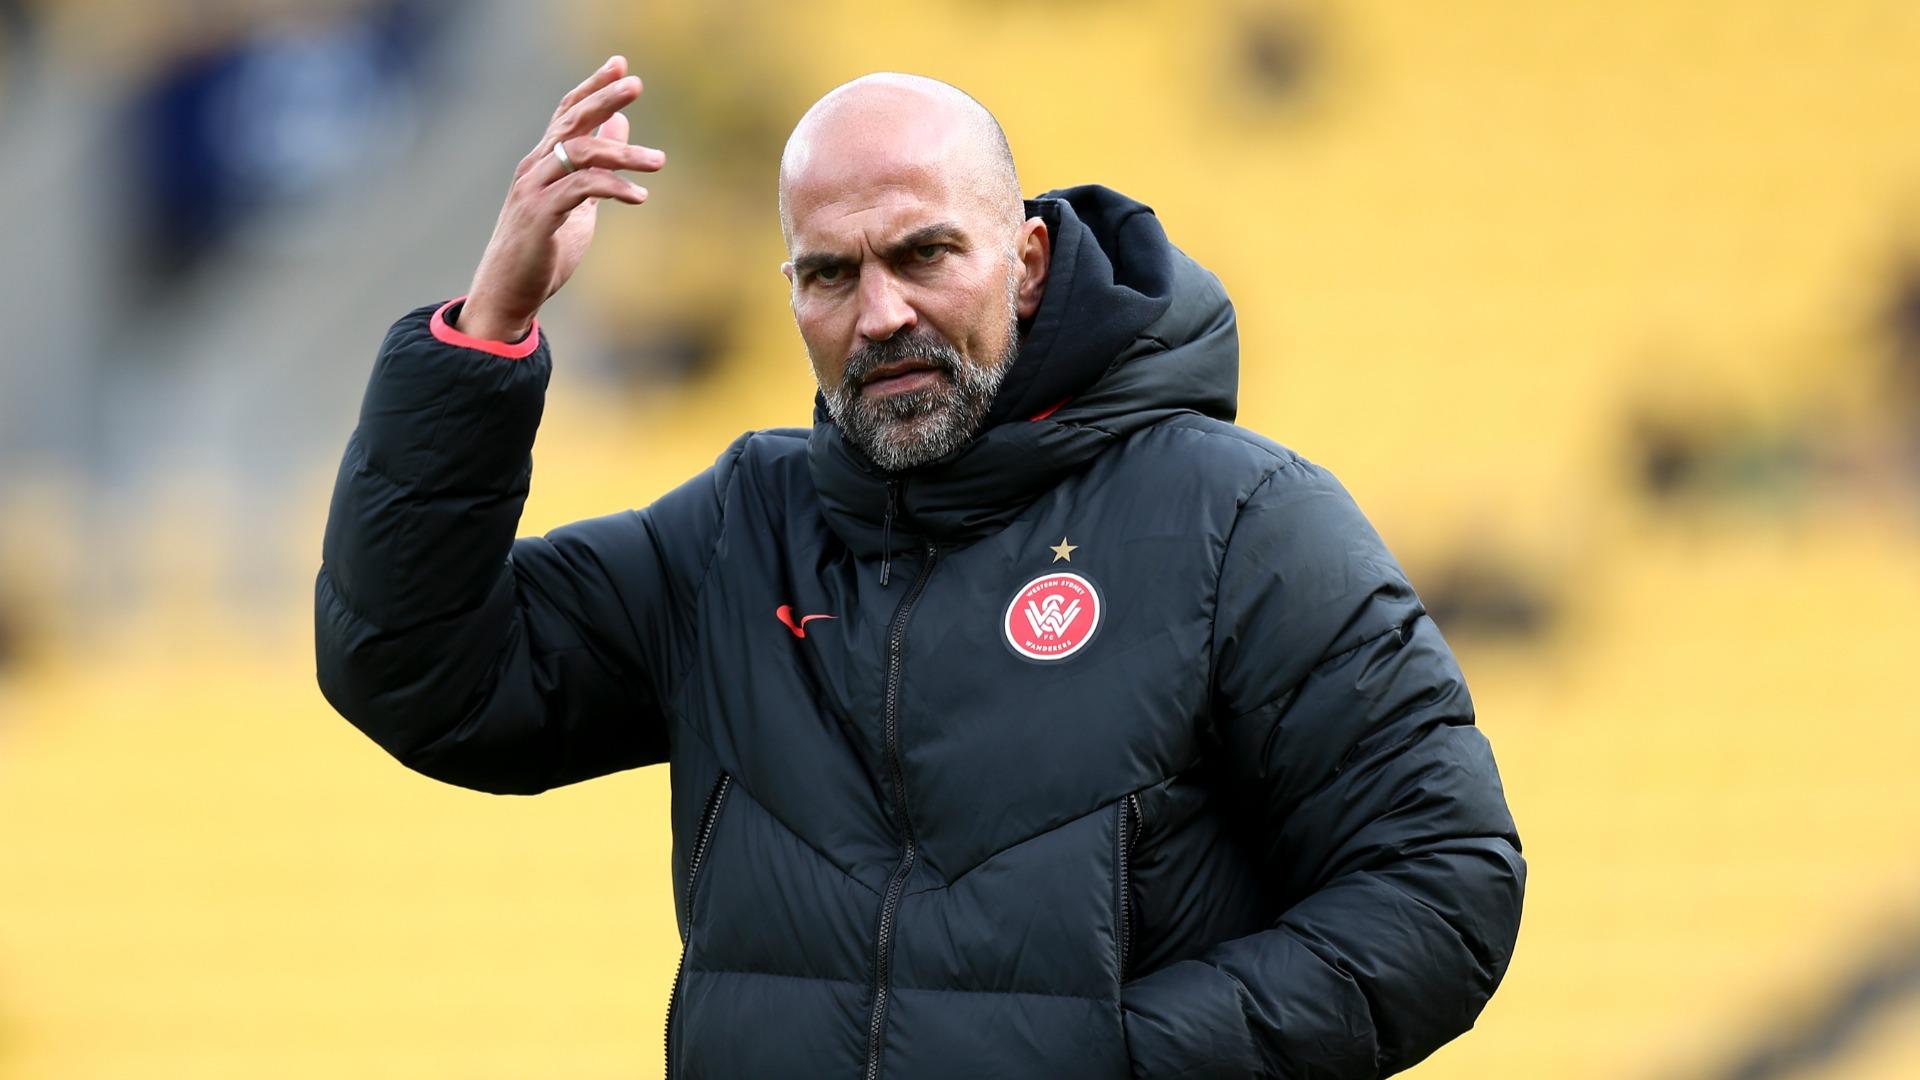 Struggling Wanderers sack coach Babbel